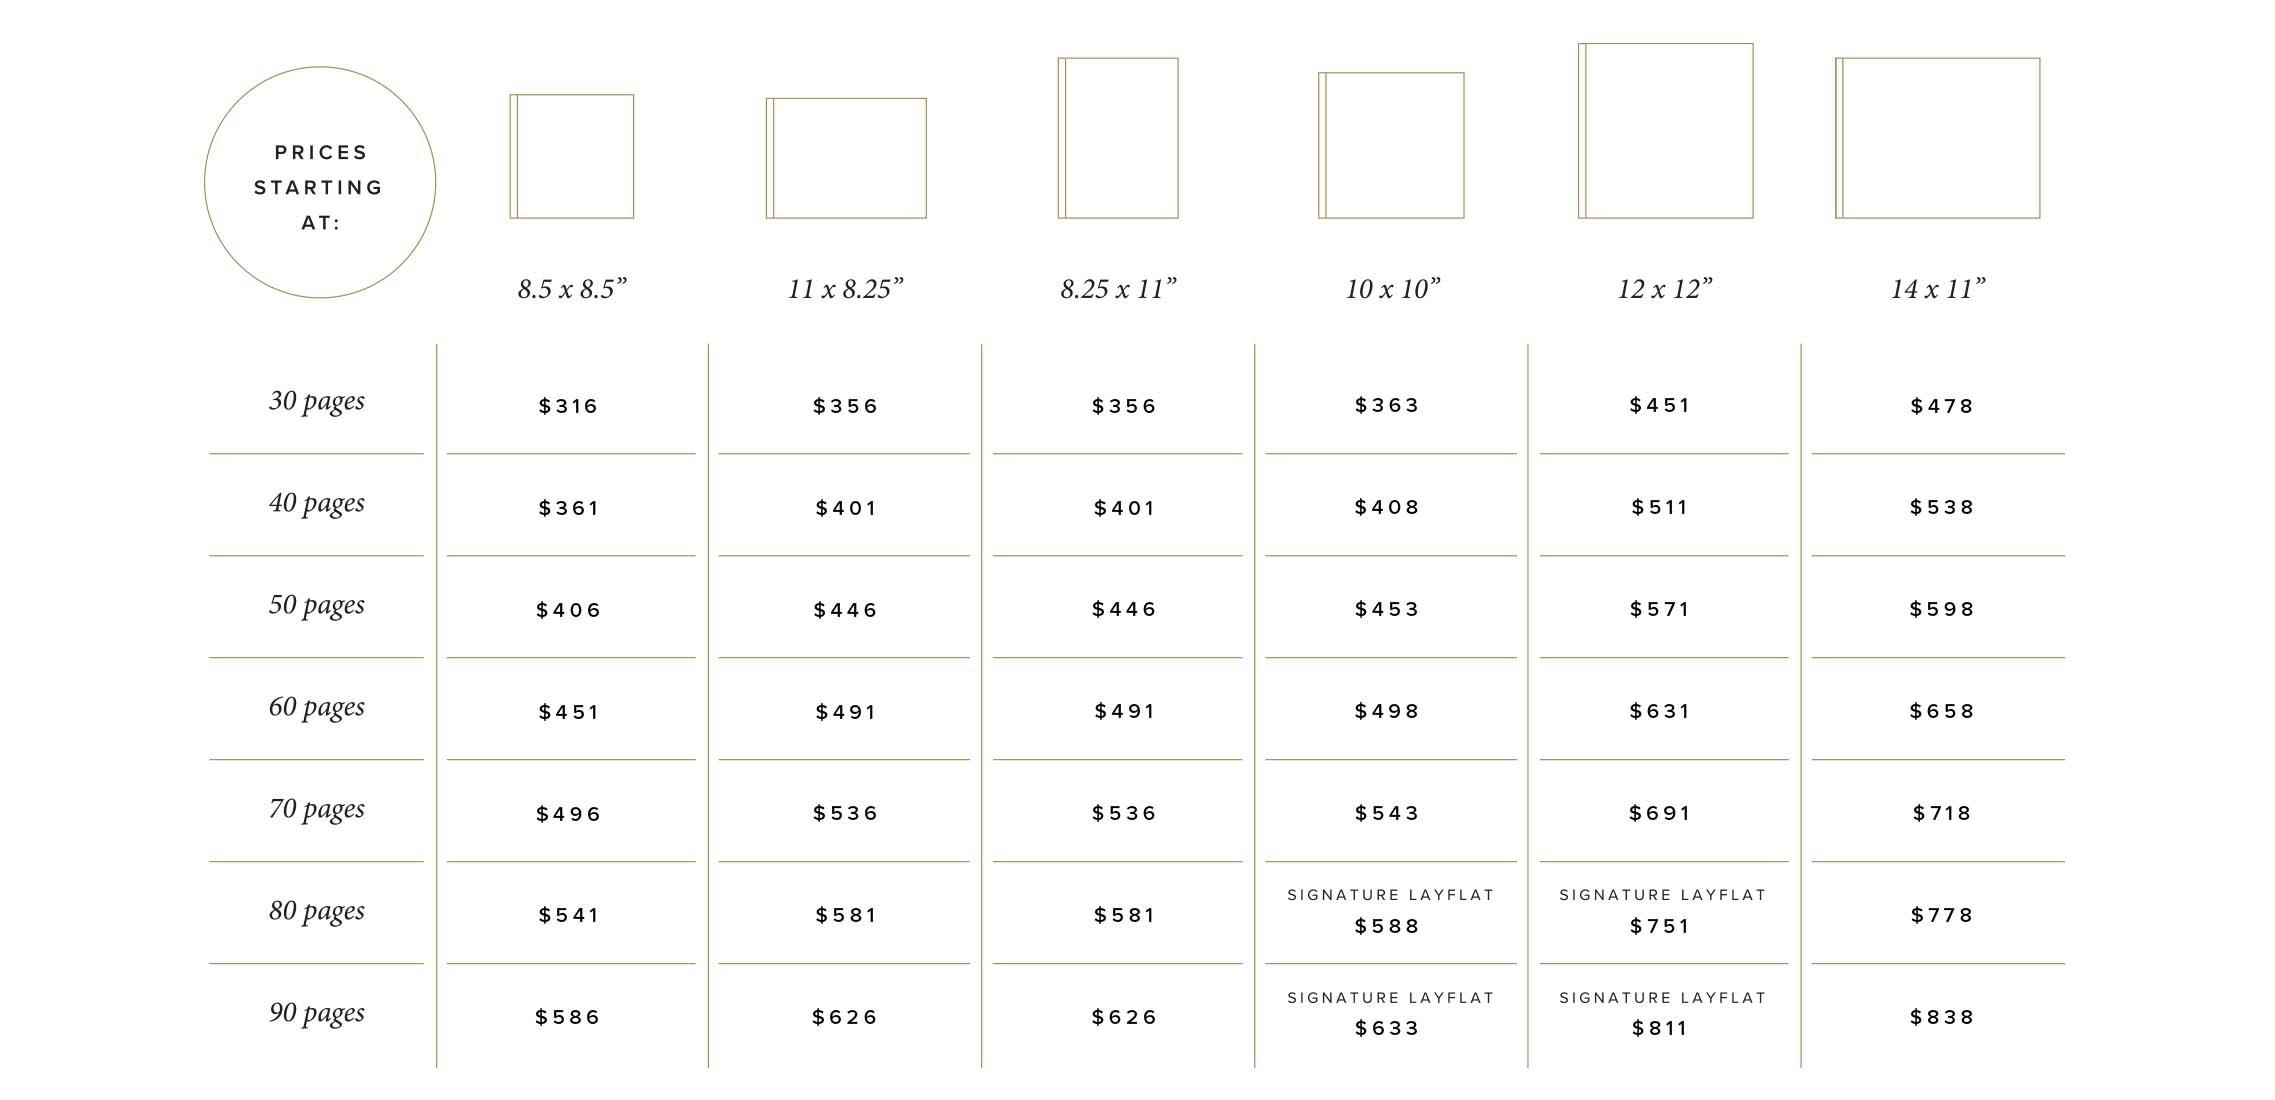 Layflat Photo Album Pricing Guide